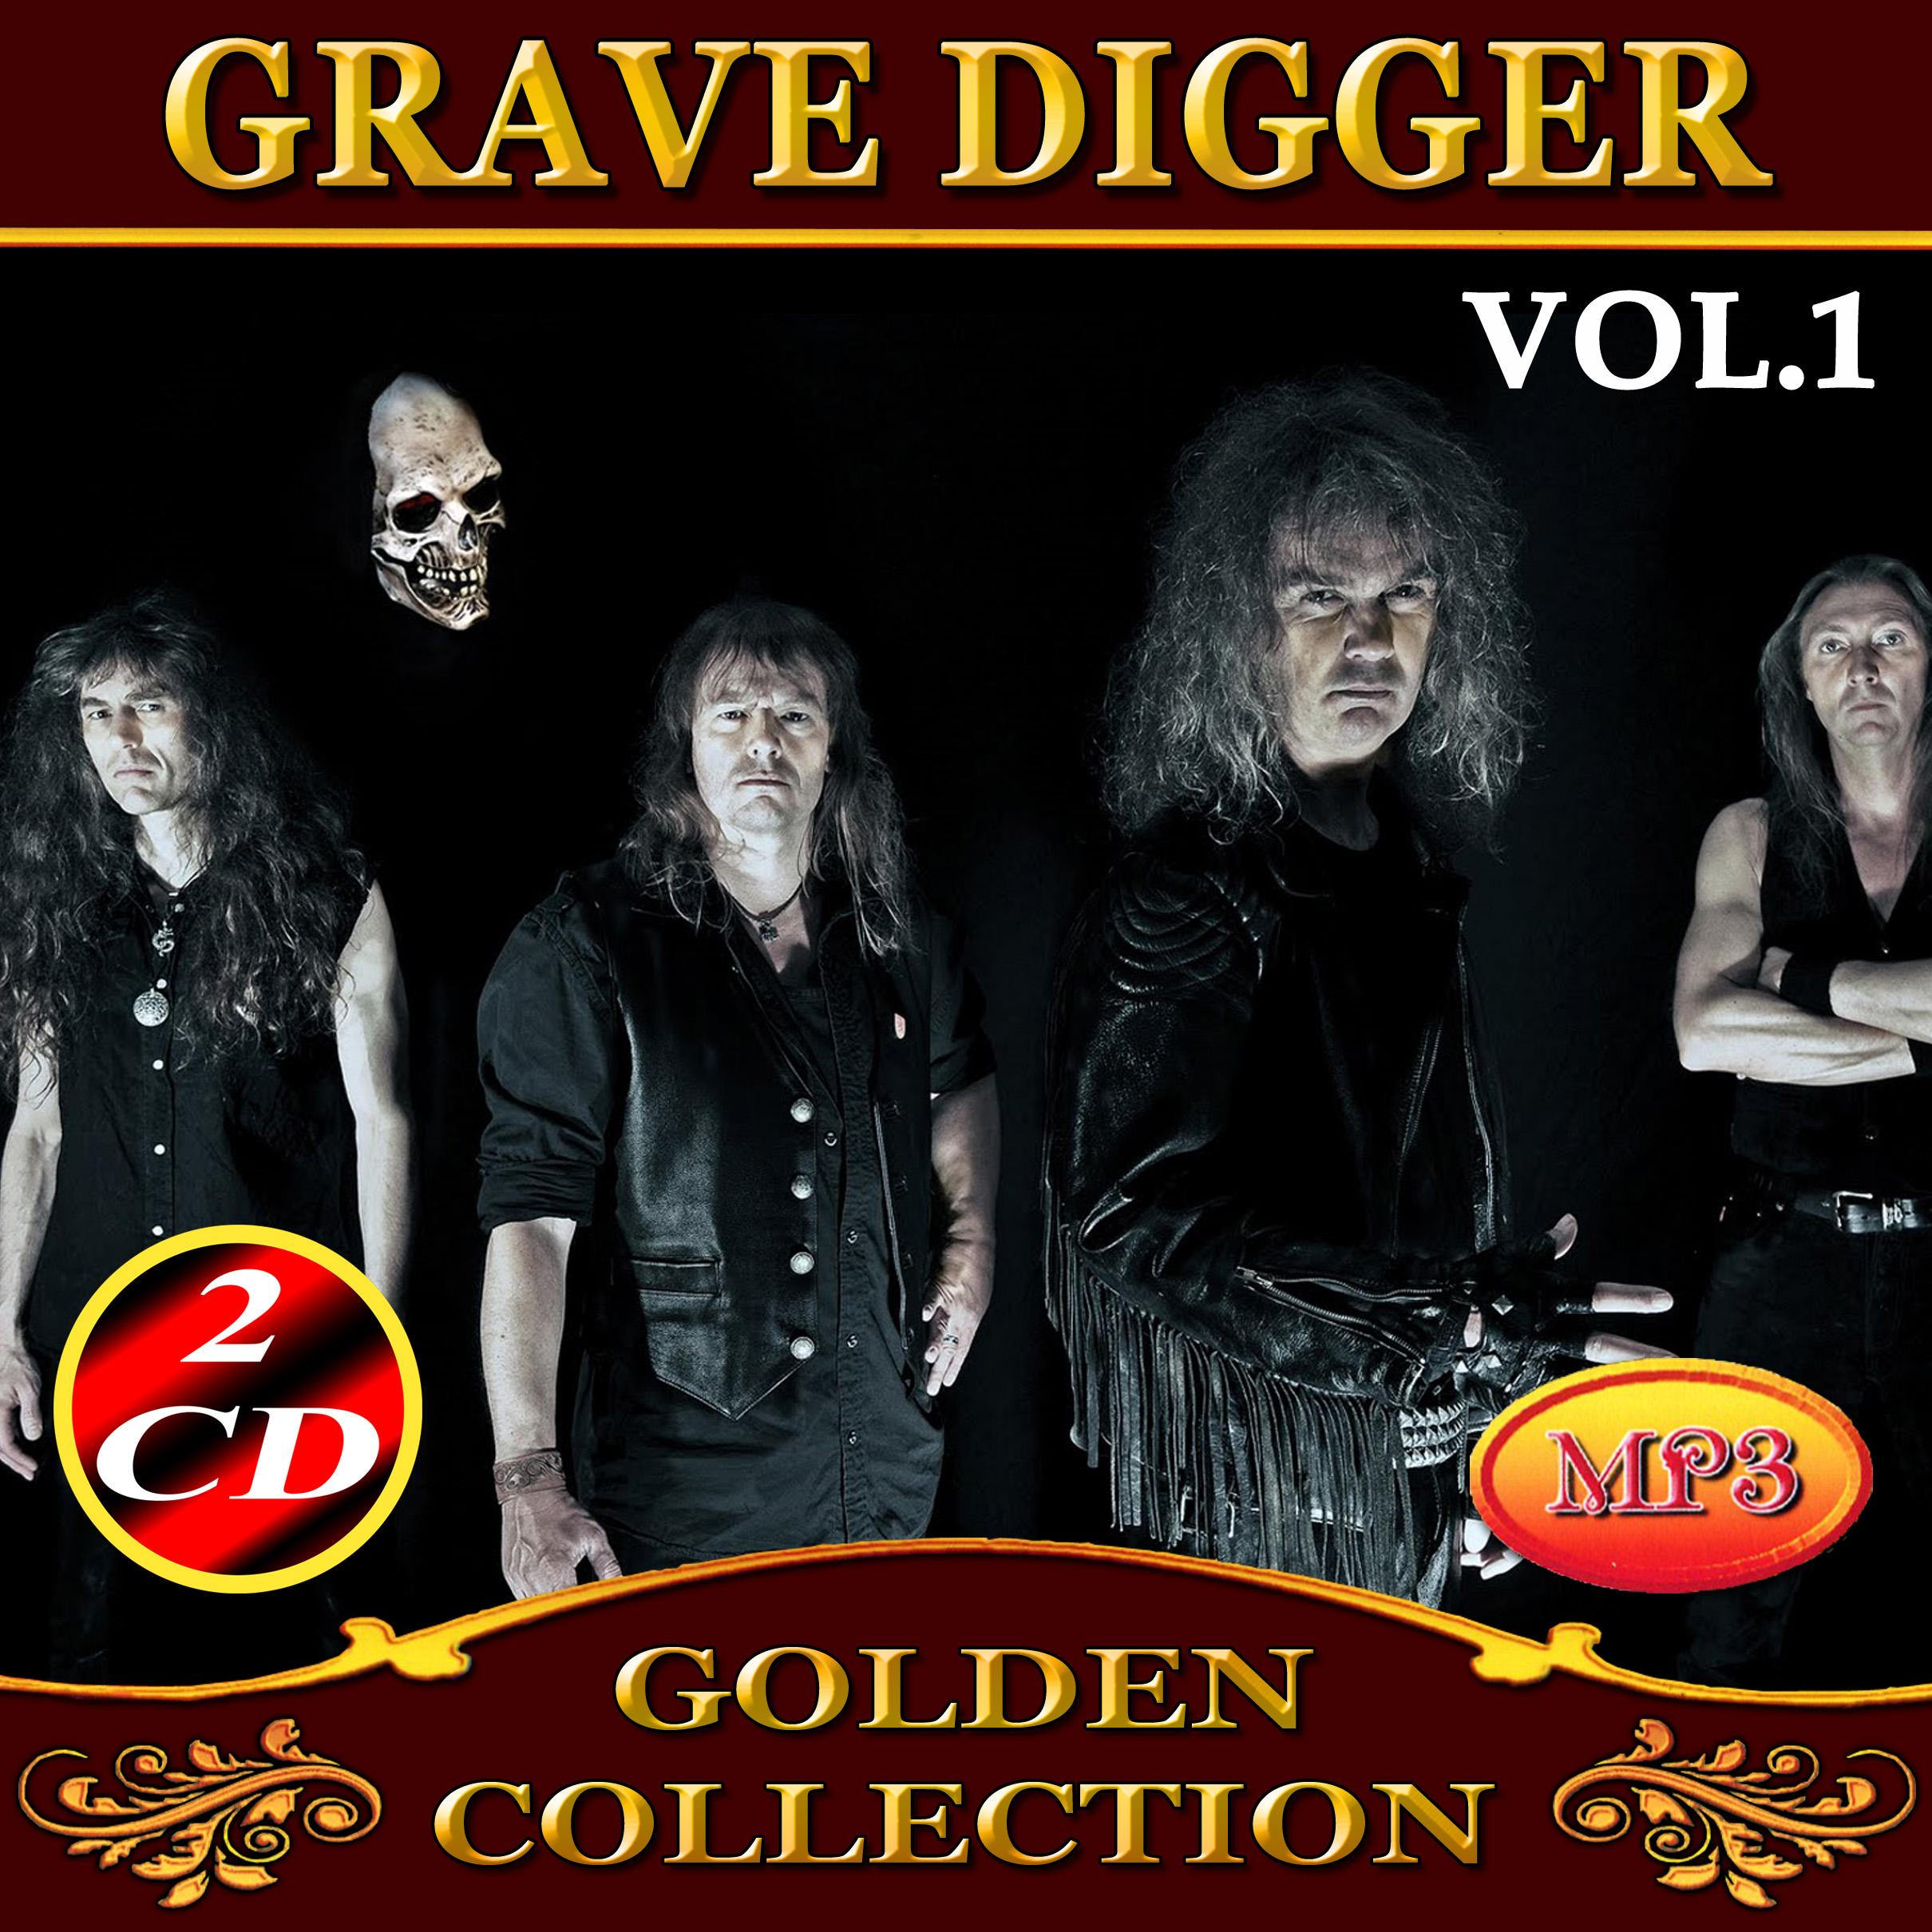 Grave Digger 1ч2cd [mp3]